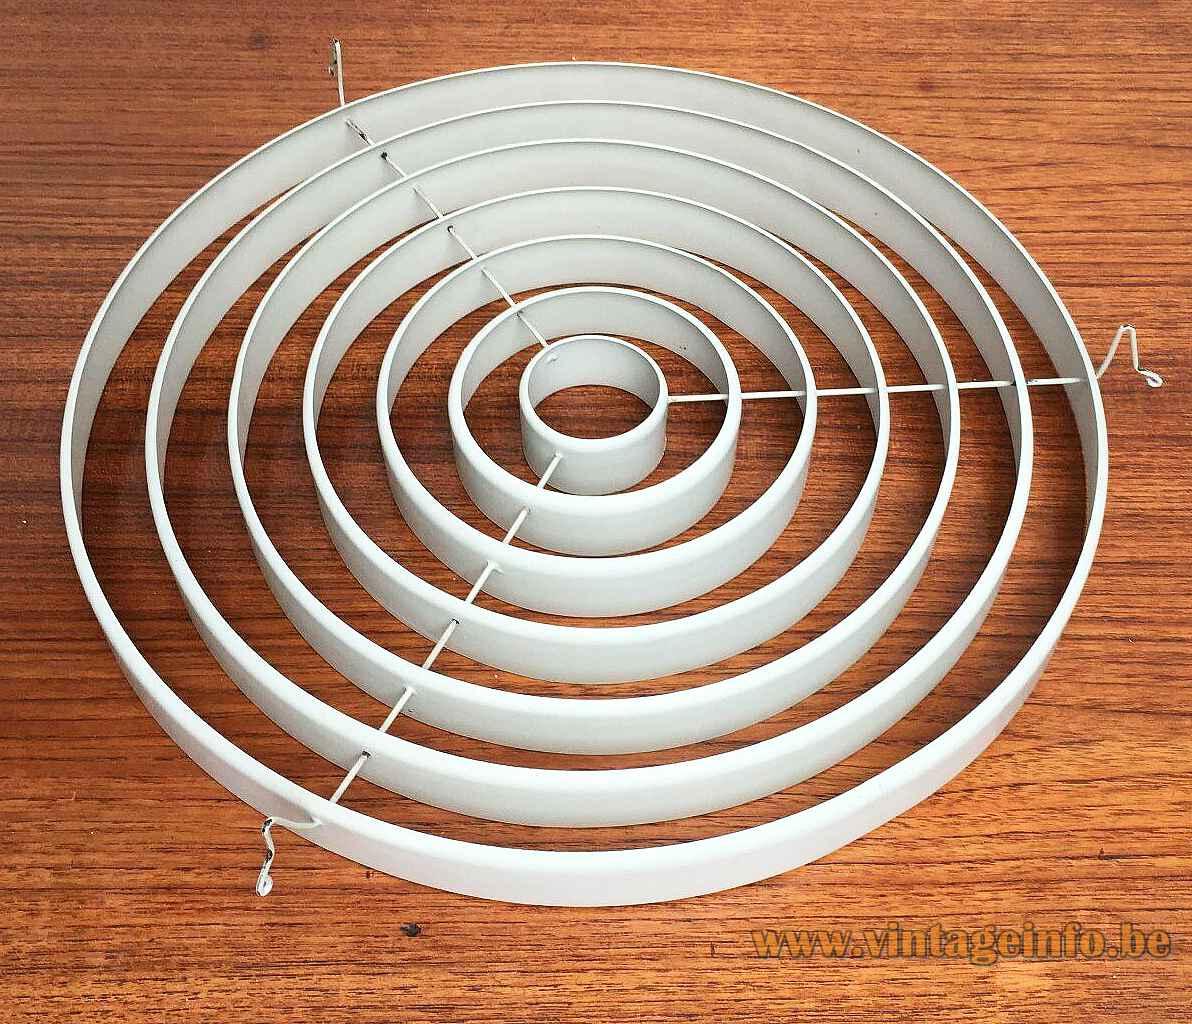 Louis Poulsen Louisiana pendant lamp round metal grid diffuser 1960s design: Vilhelm Wohlert Jørgen Bo Denmark